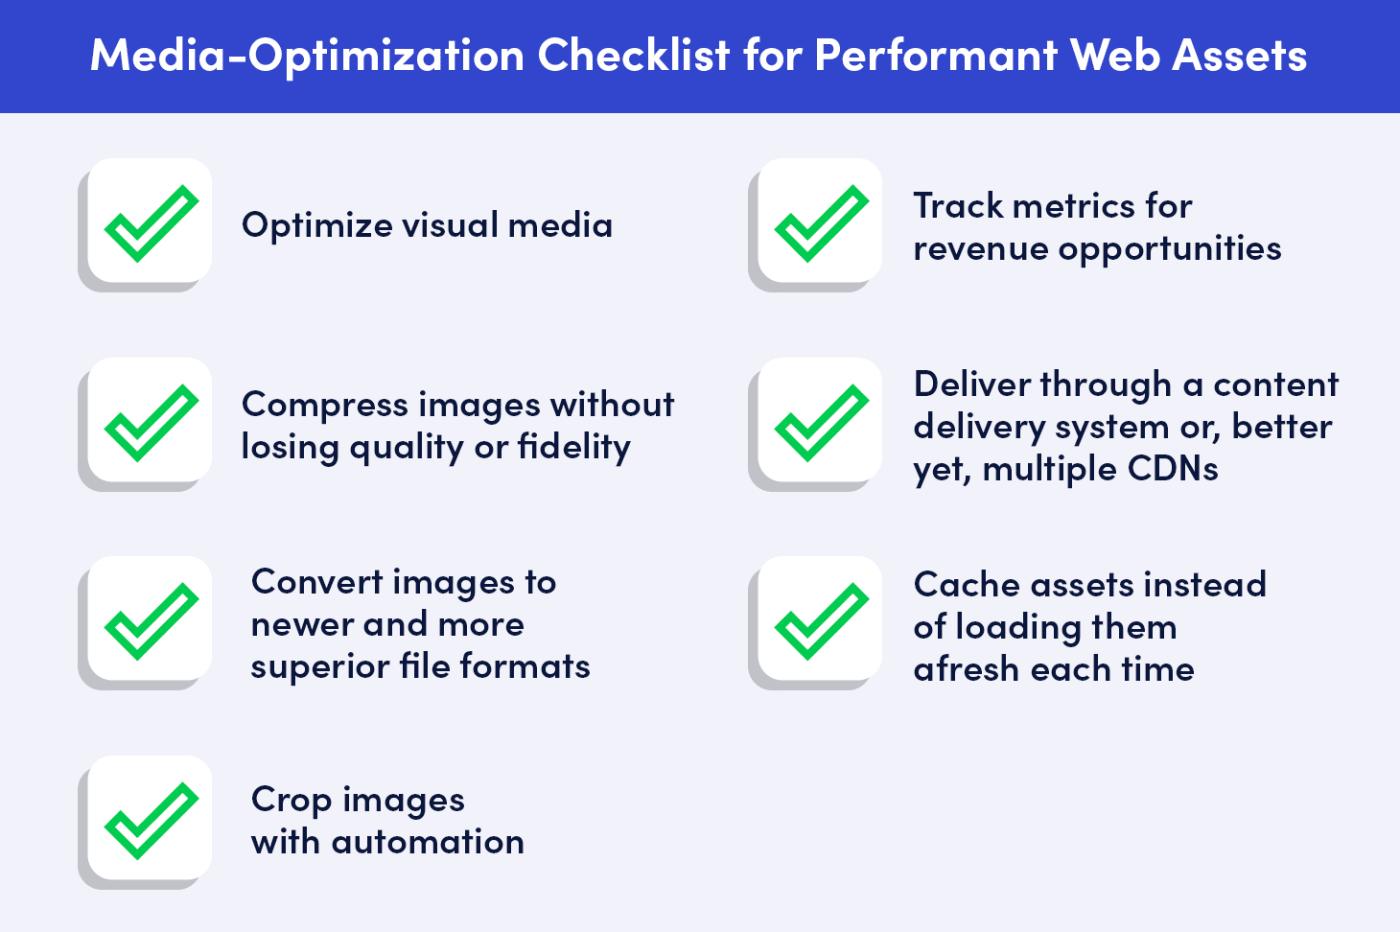 Media-optimization